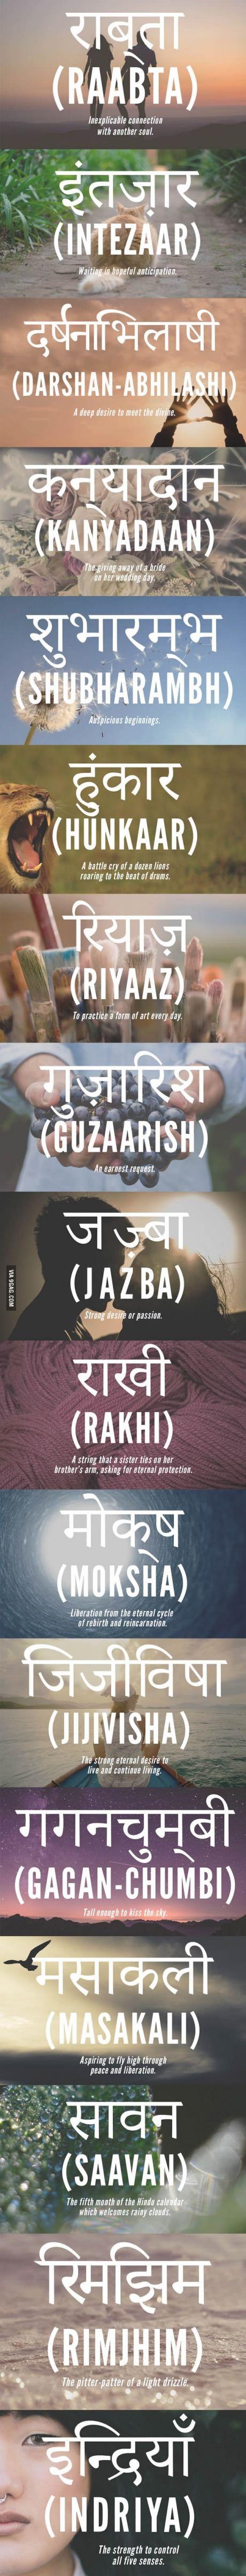 51 Best Hindi Images On Pinterest Sanskrit Languages And Language